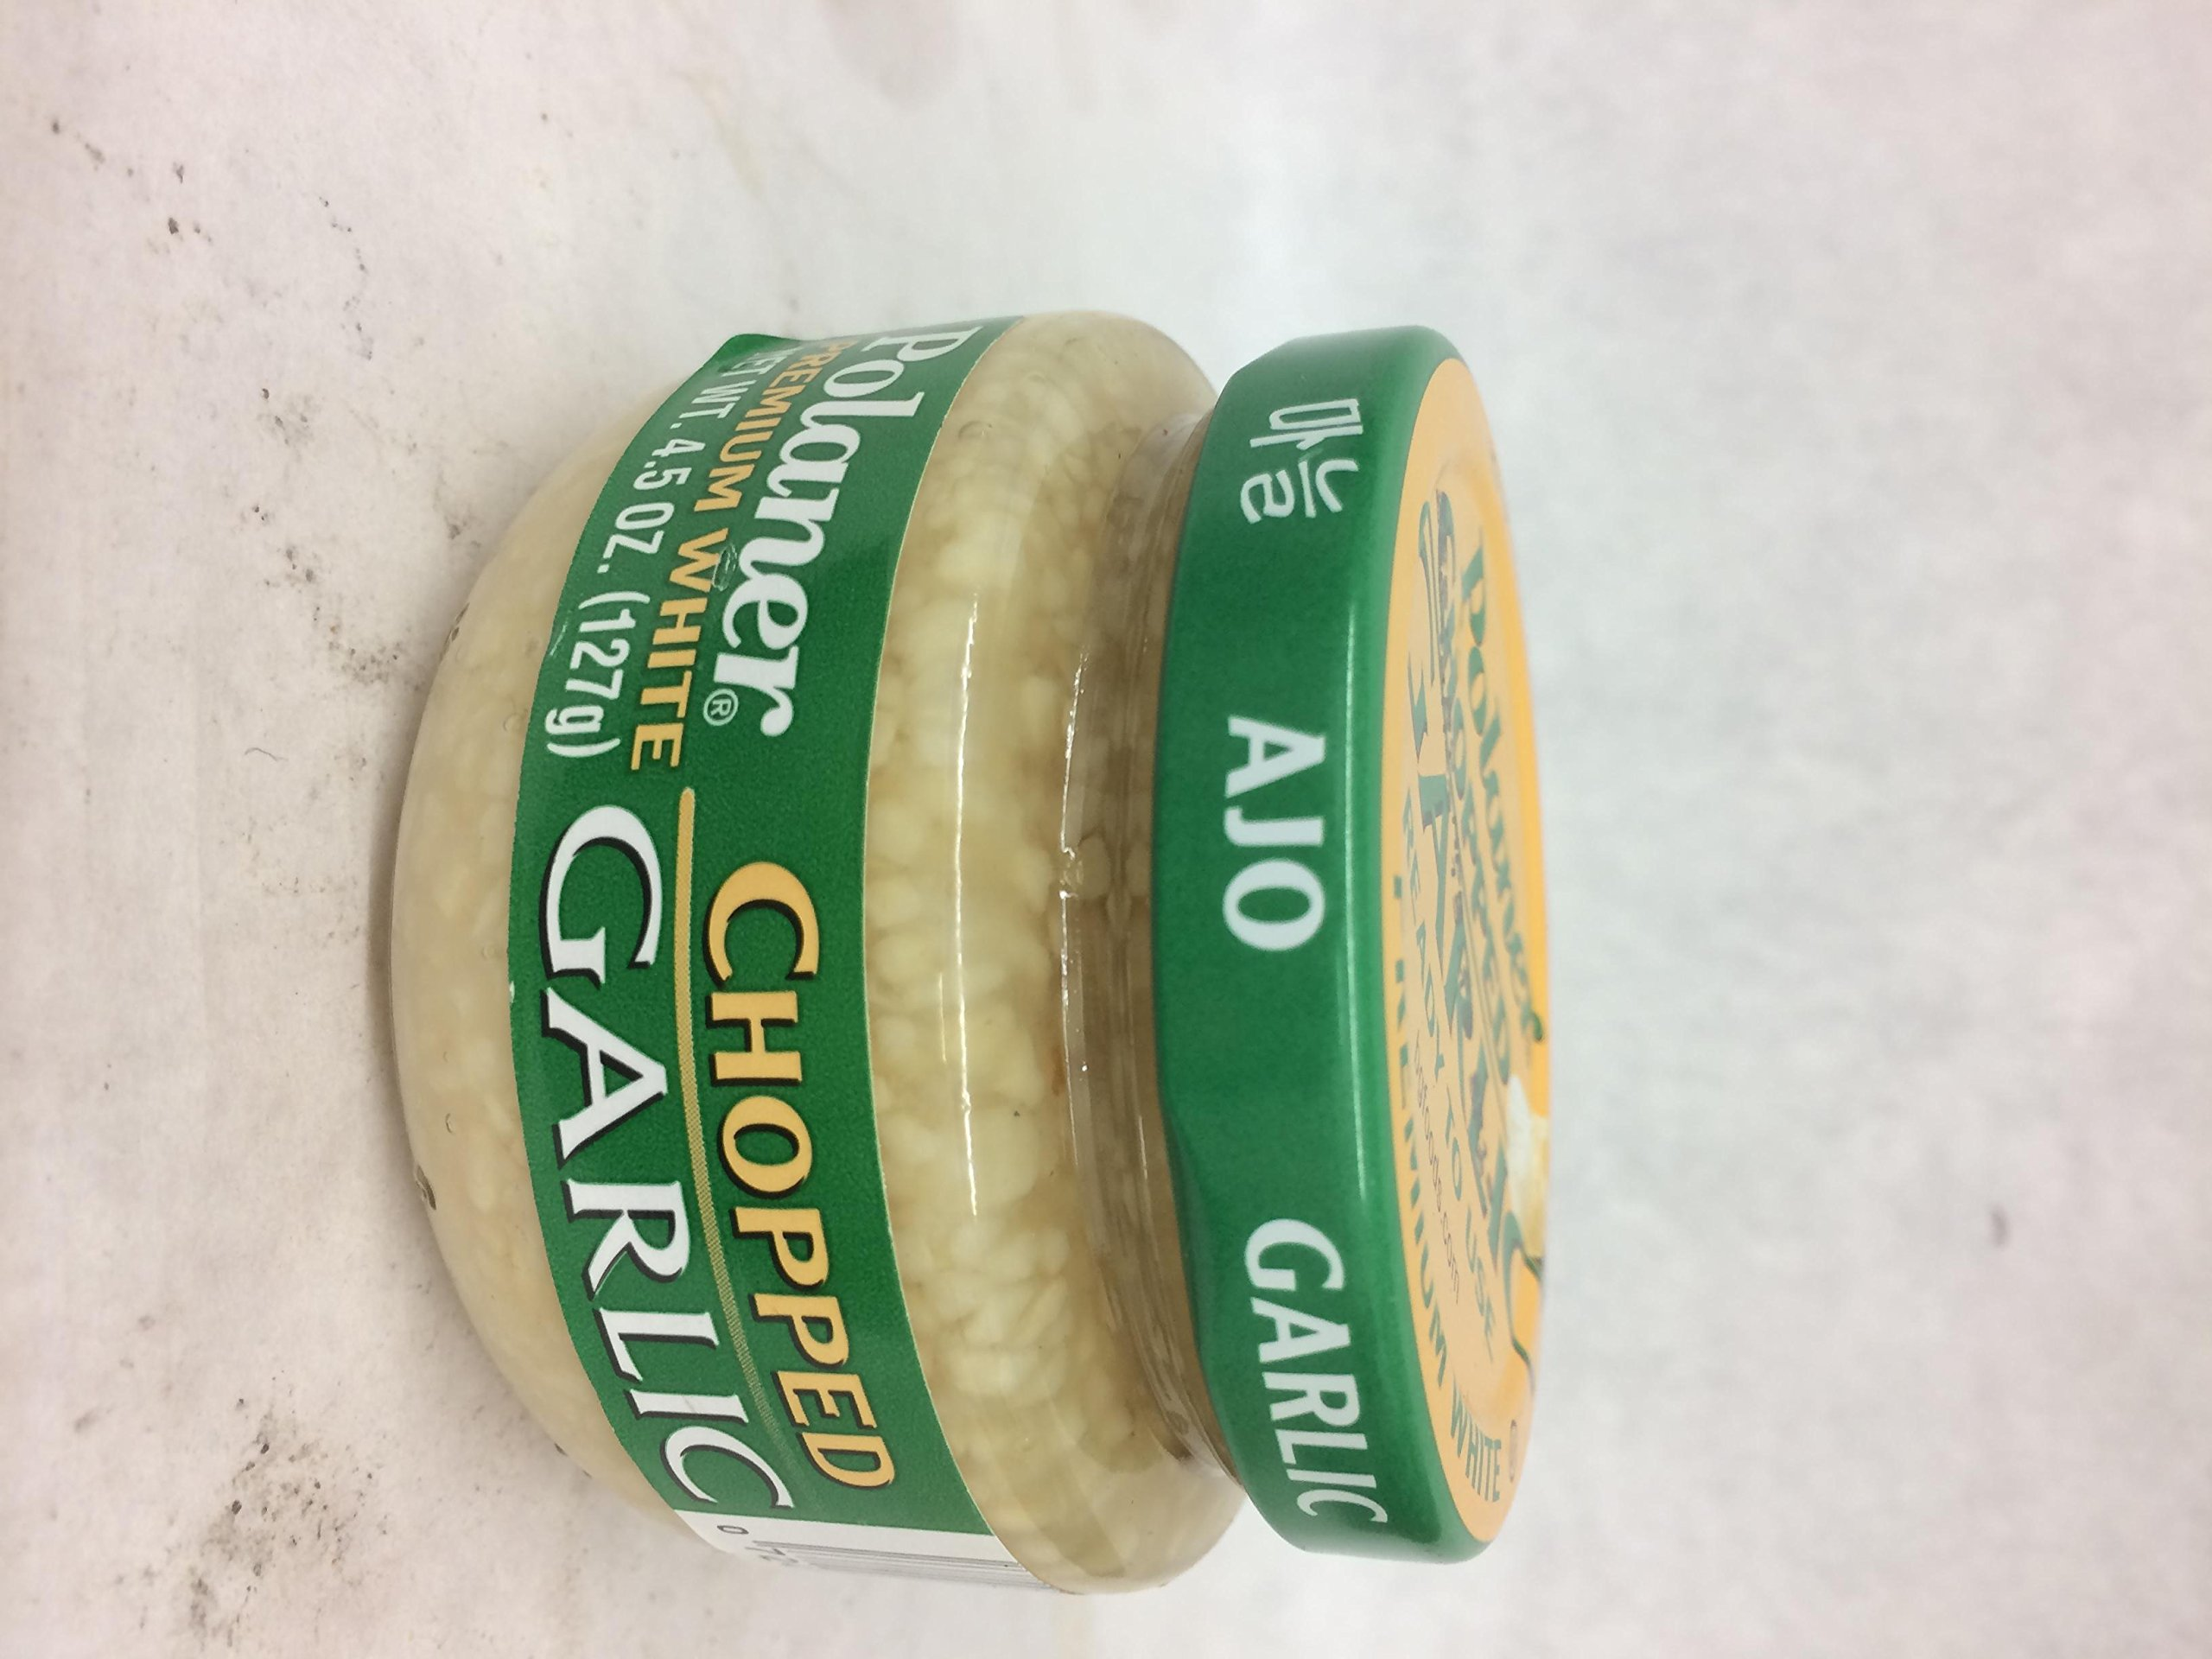 Polaner Chopped Garlic 4.5 Oz. Pk Of 3.